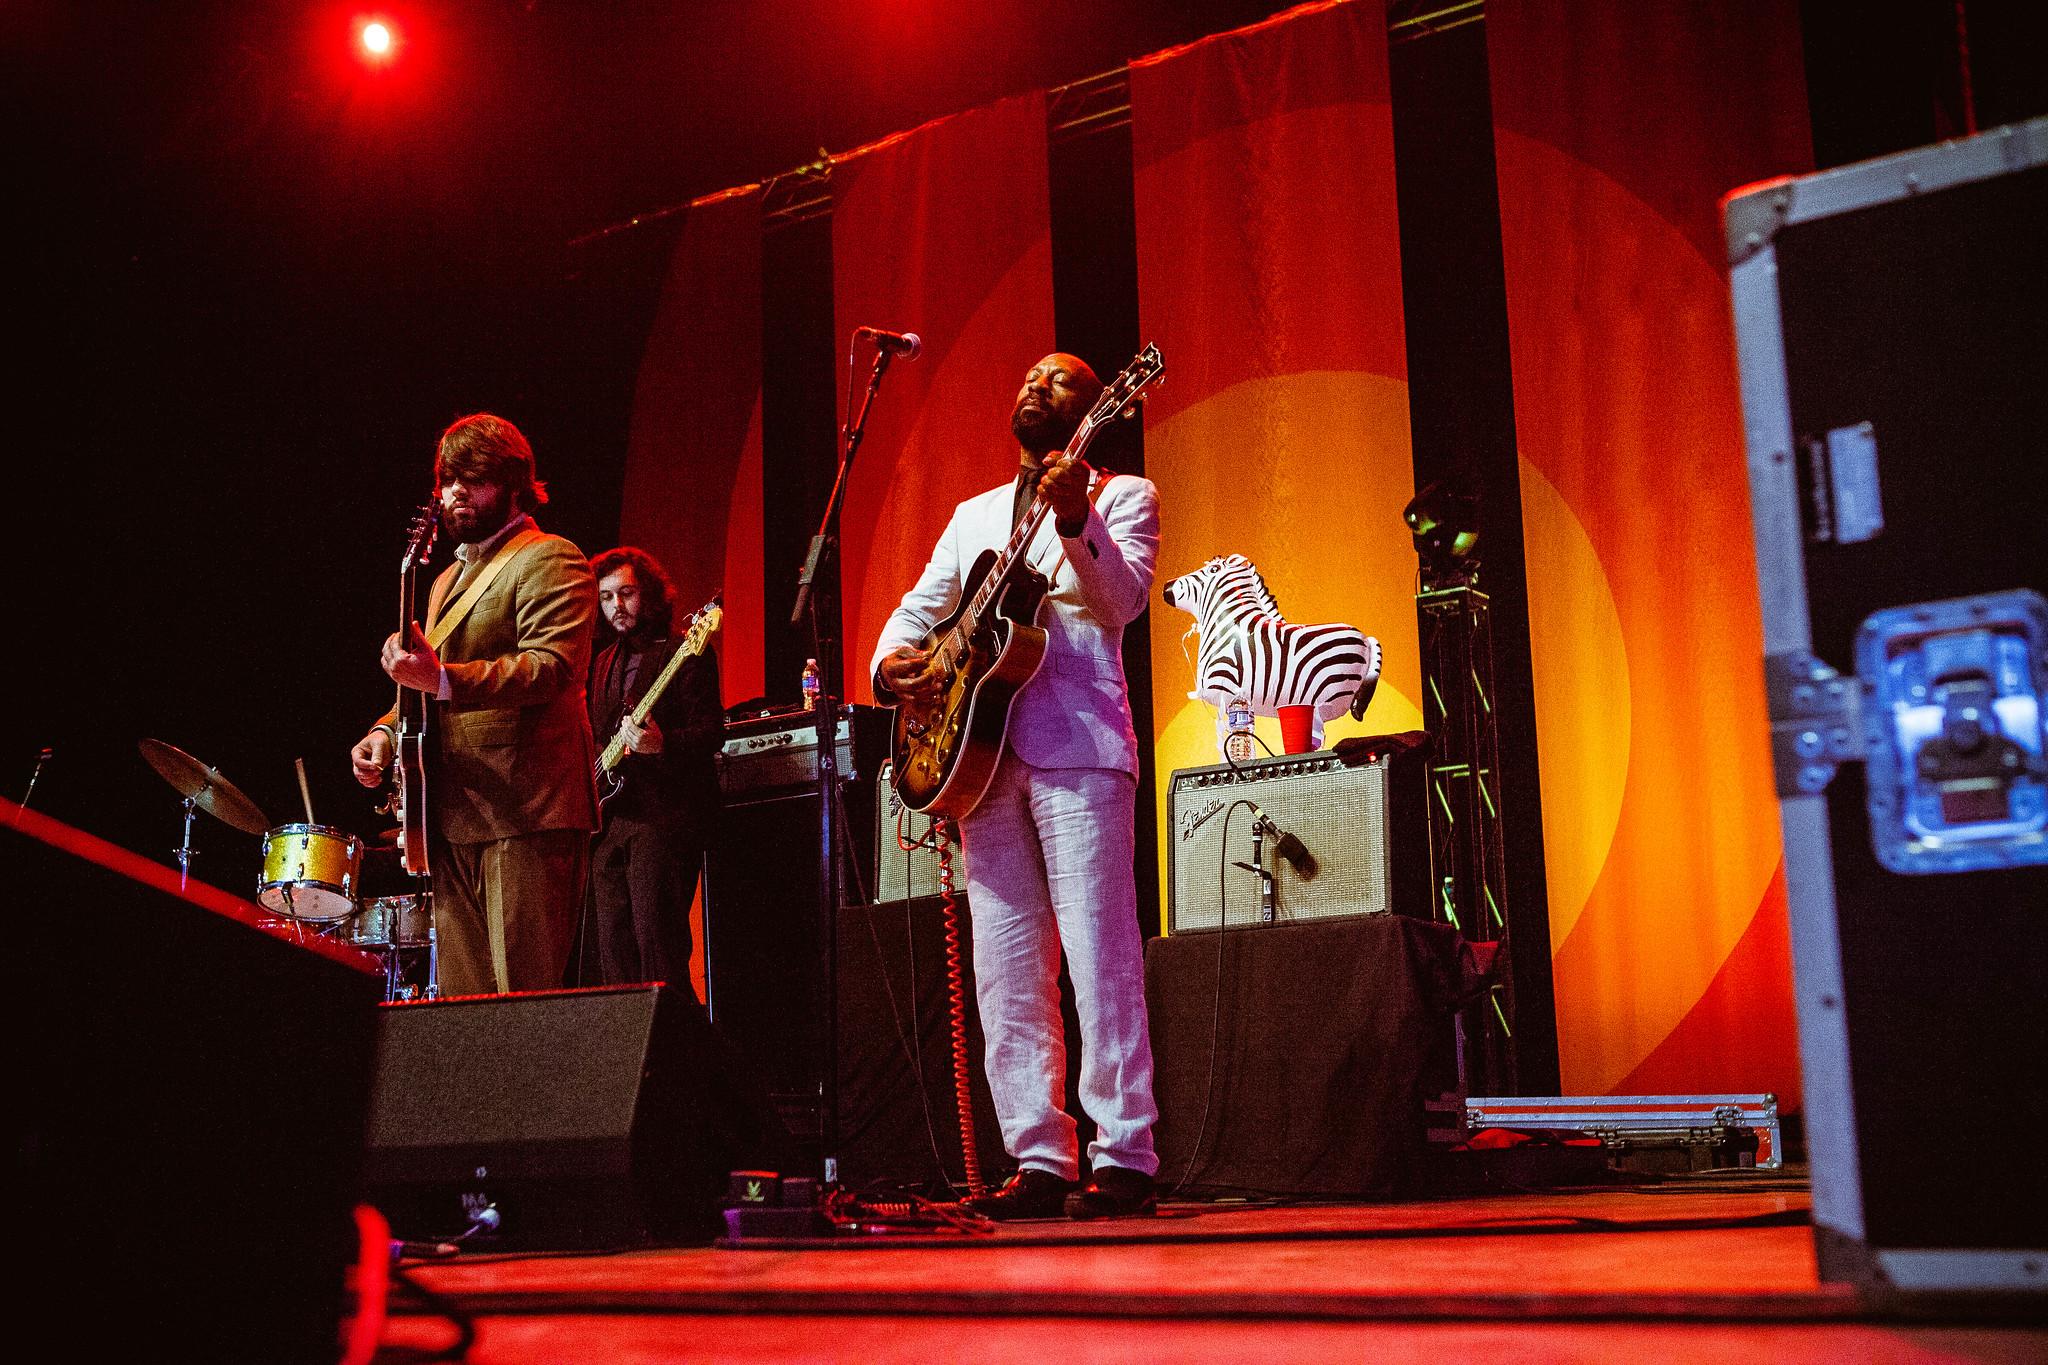 Sharon Jones & The Dap Kings